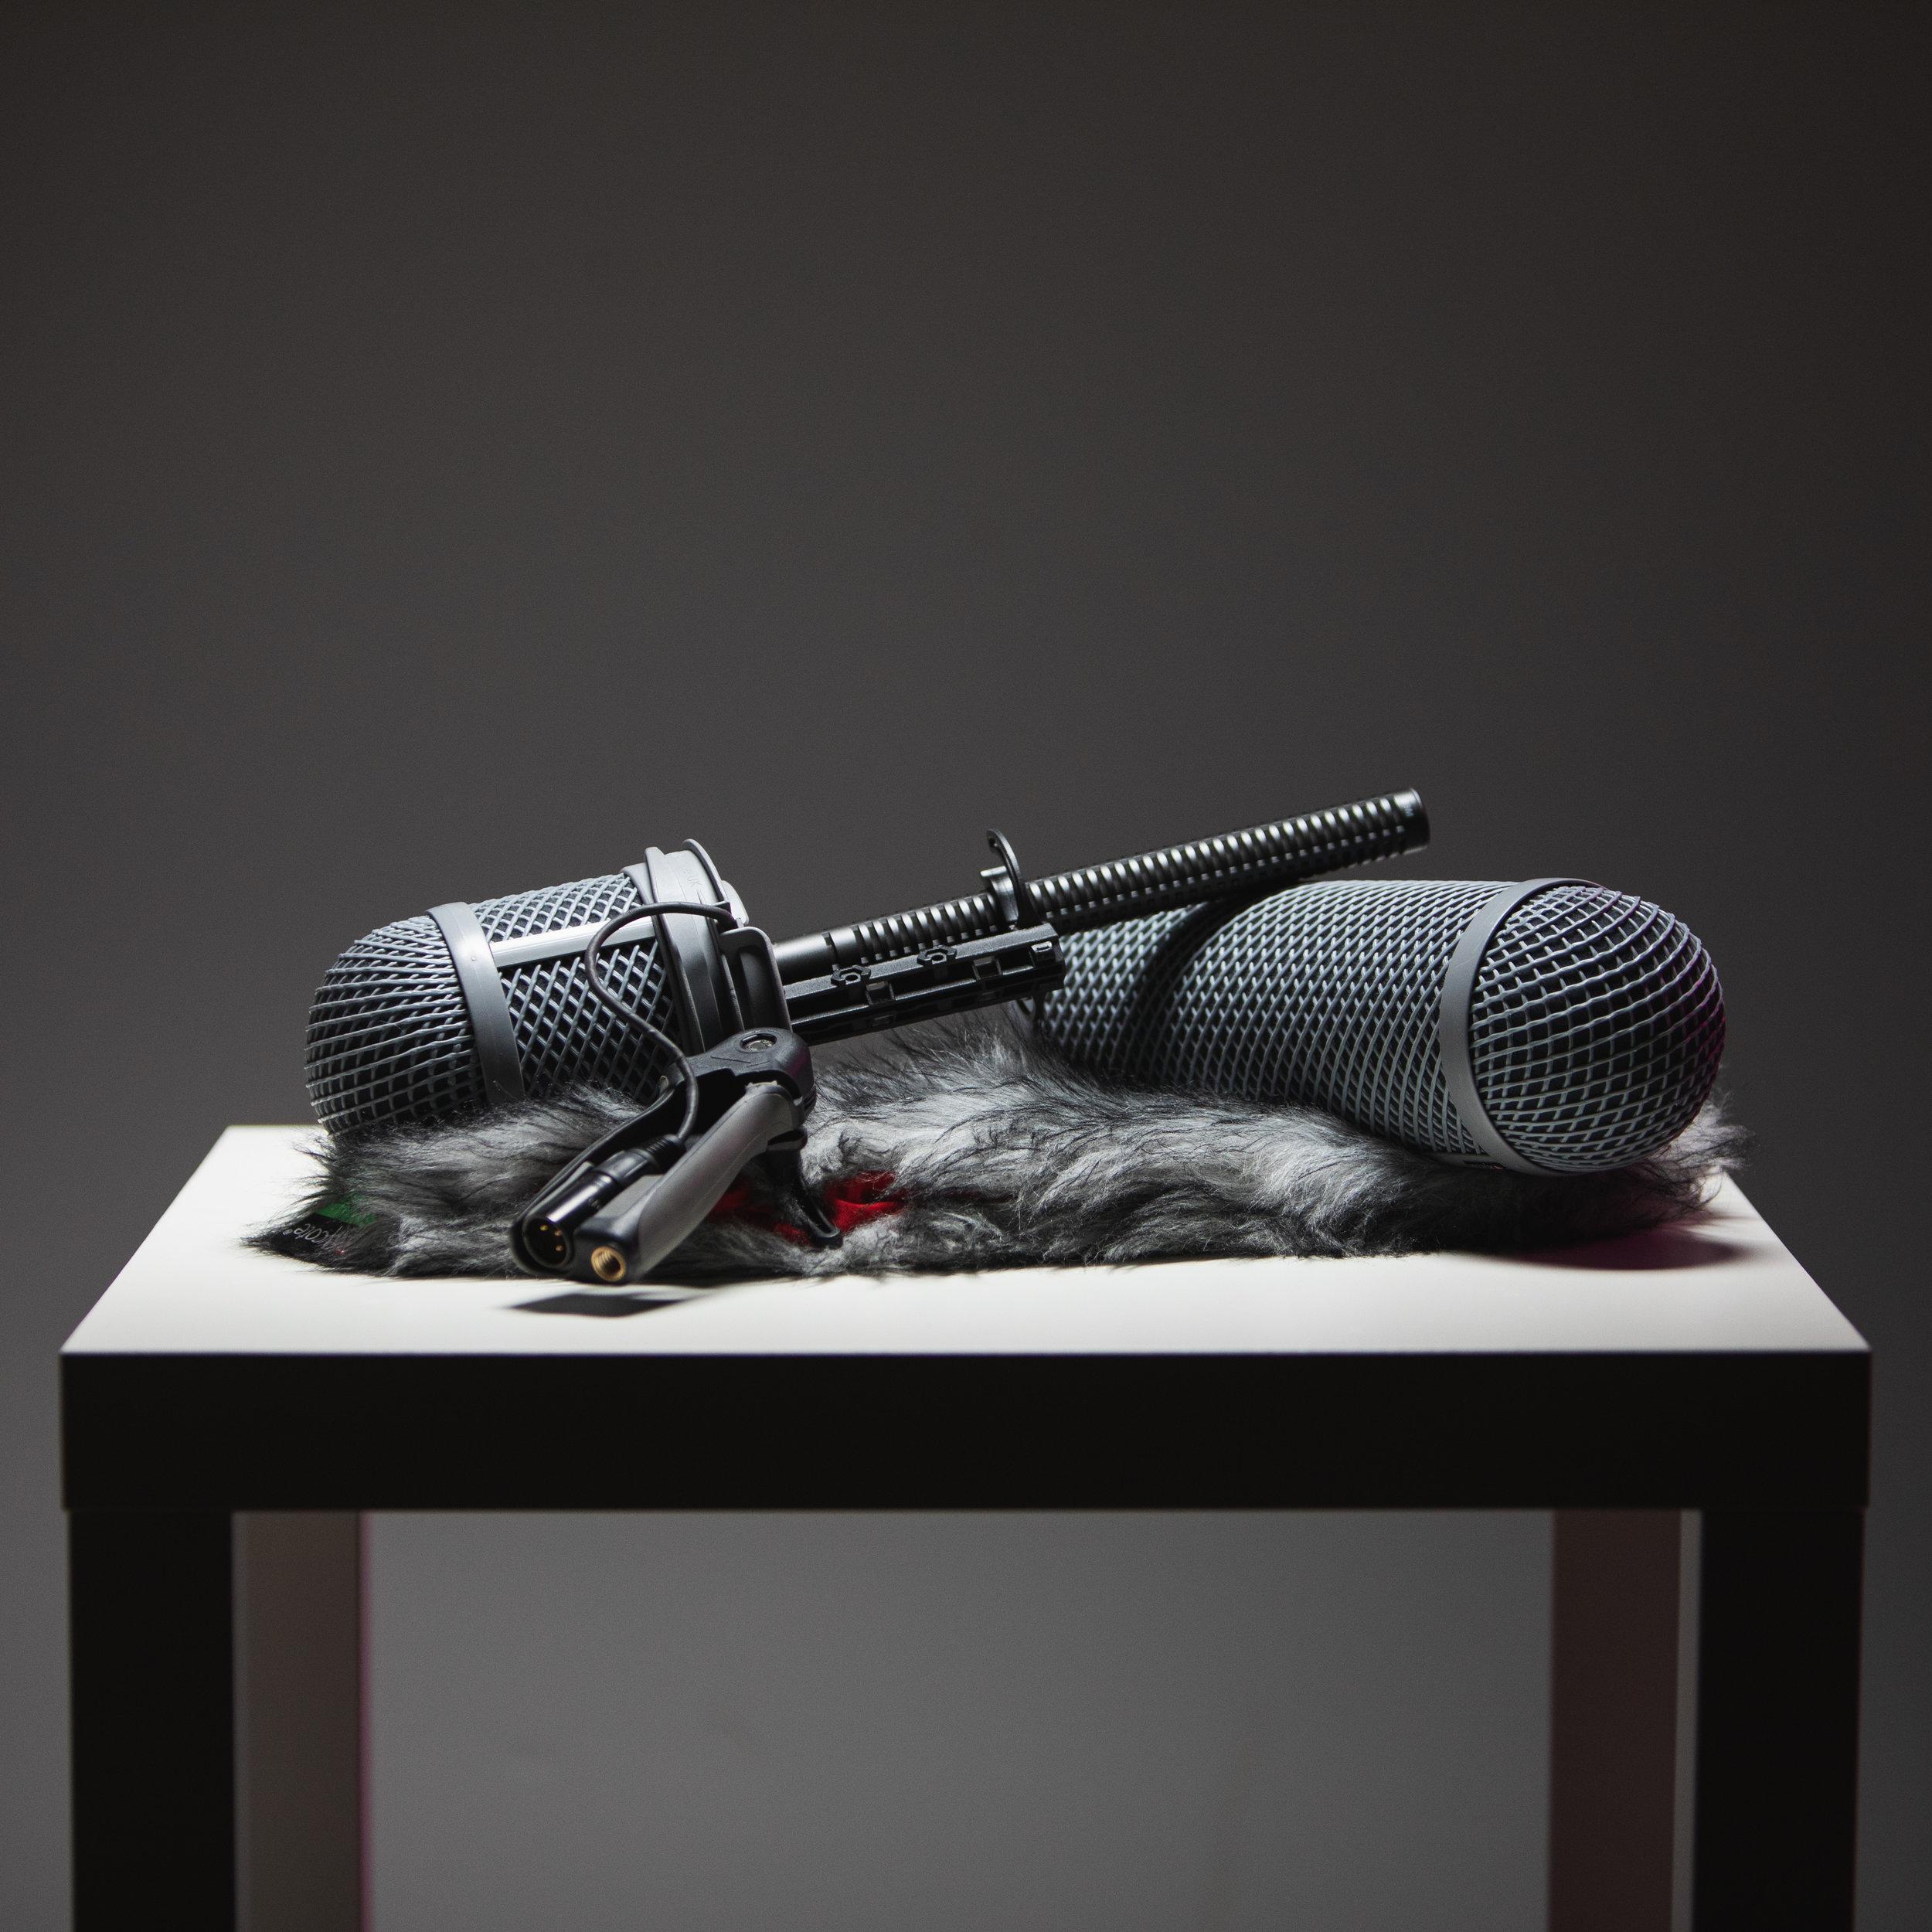 Shure VP89S Shotgun Microphone